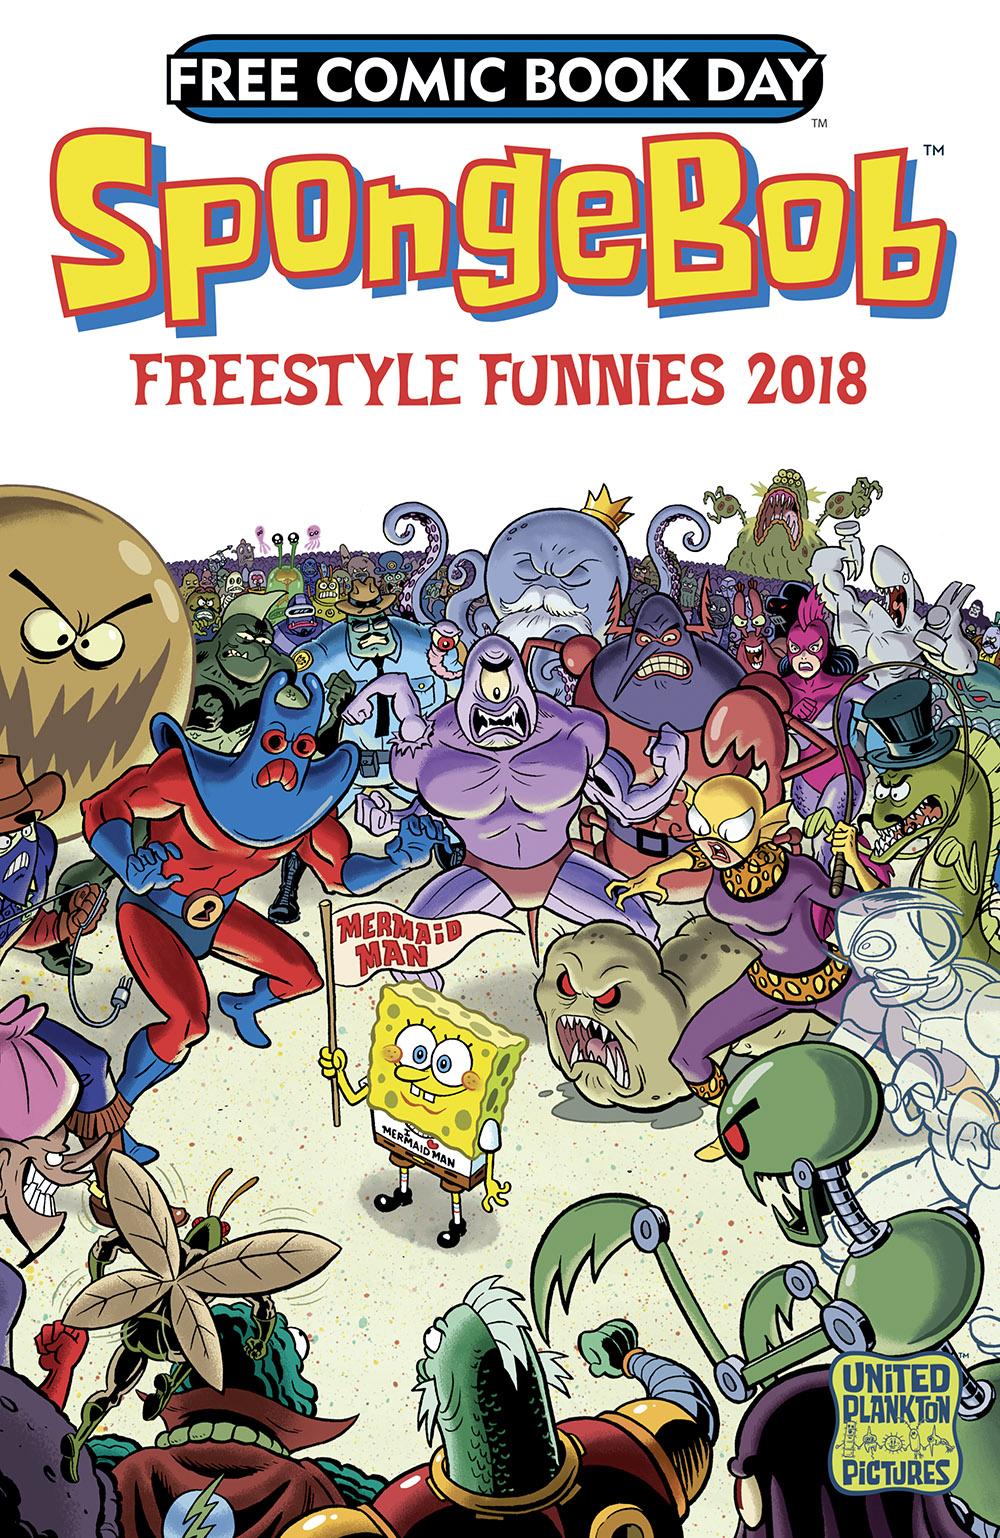 FCBD18_S_United Plankton_SpongeBob Freestyle 18.jpg